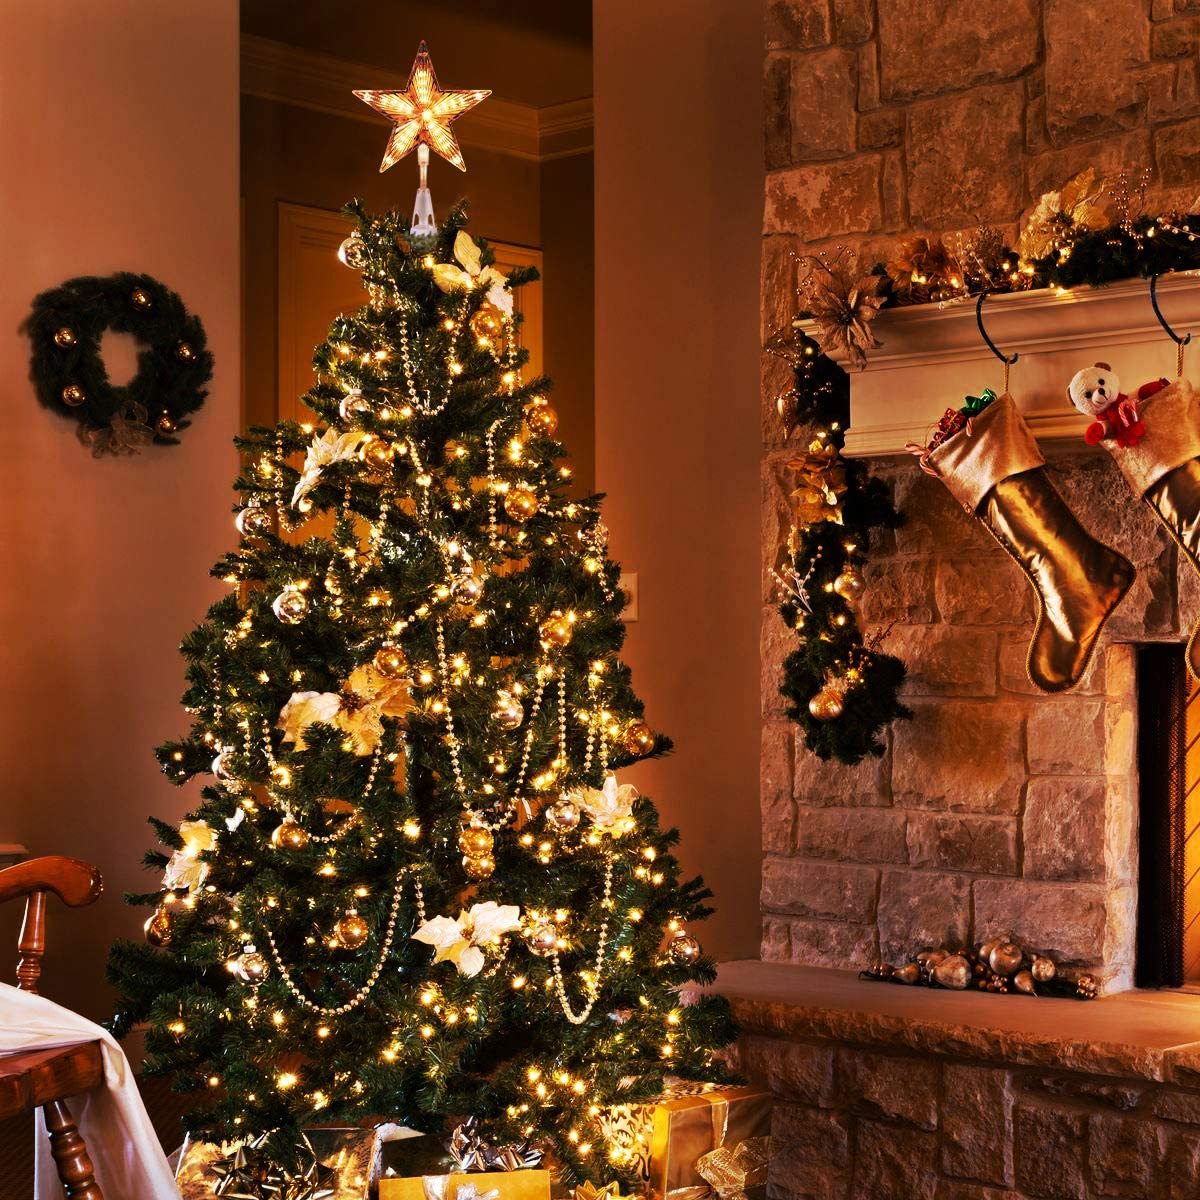 Christmas tree decoration, Christmas Tree Topper Clear Tree Topper Light for Christmas Tree Ornaments